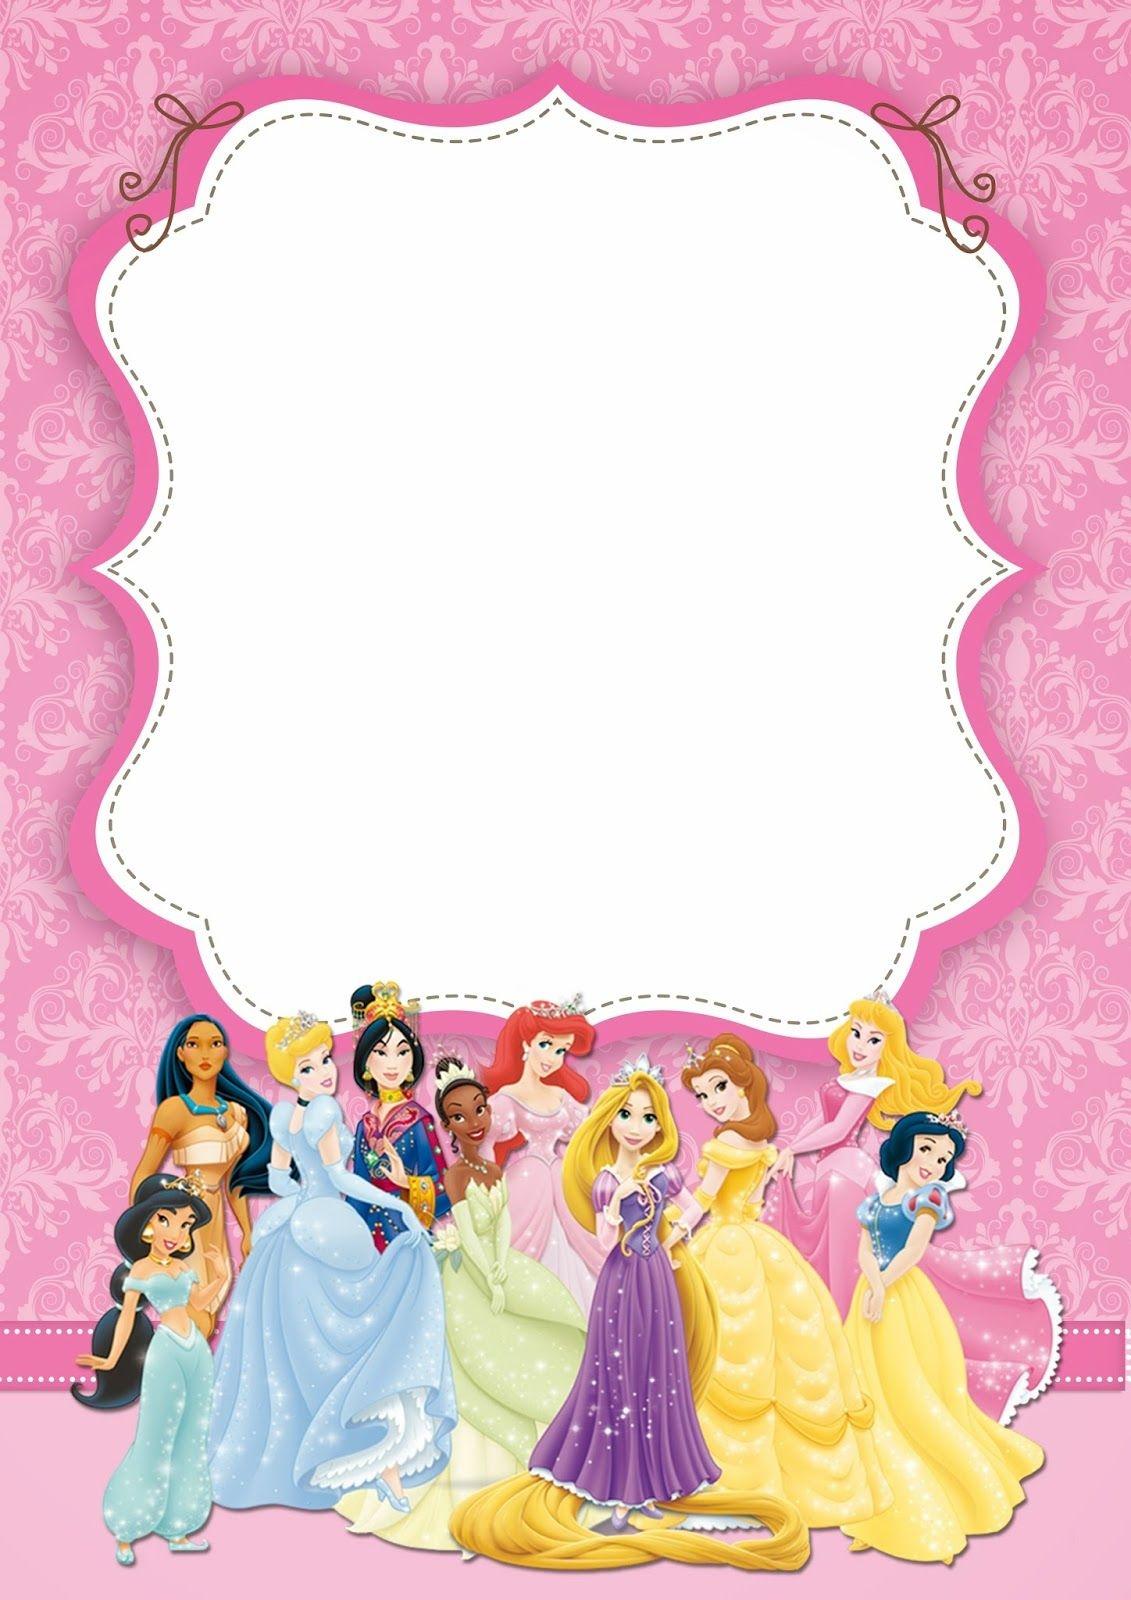 Free Printable Disney Princess Ticket Invitation | Free Printable - Free Printable Disney Invitations